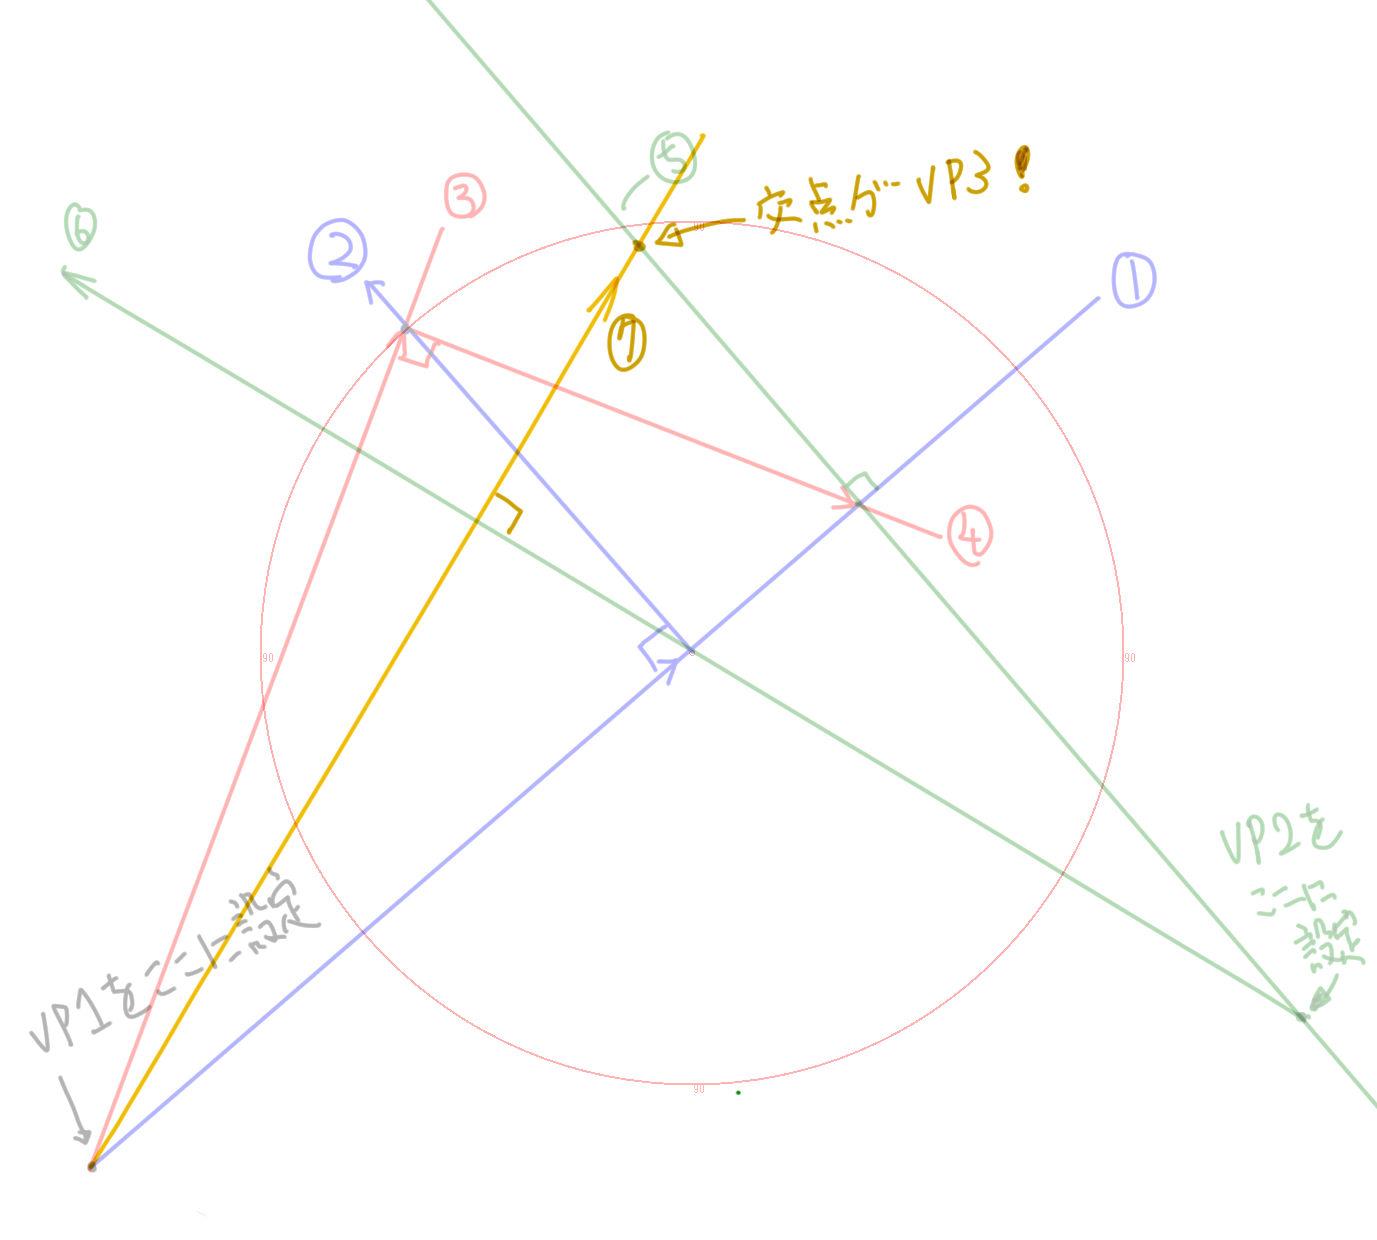 toushizuVP3-5.jpg